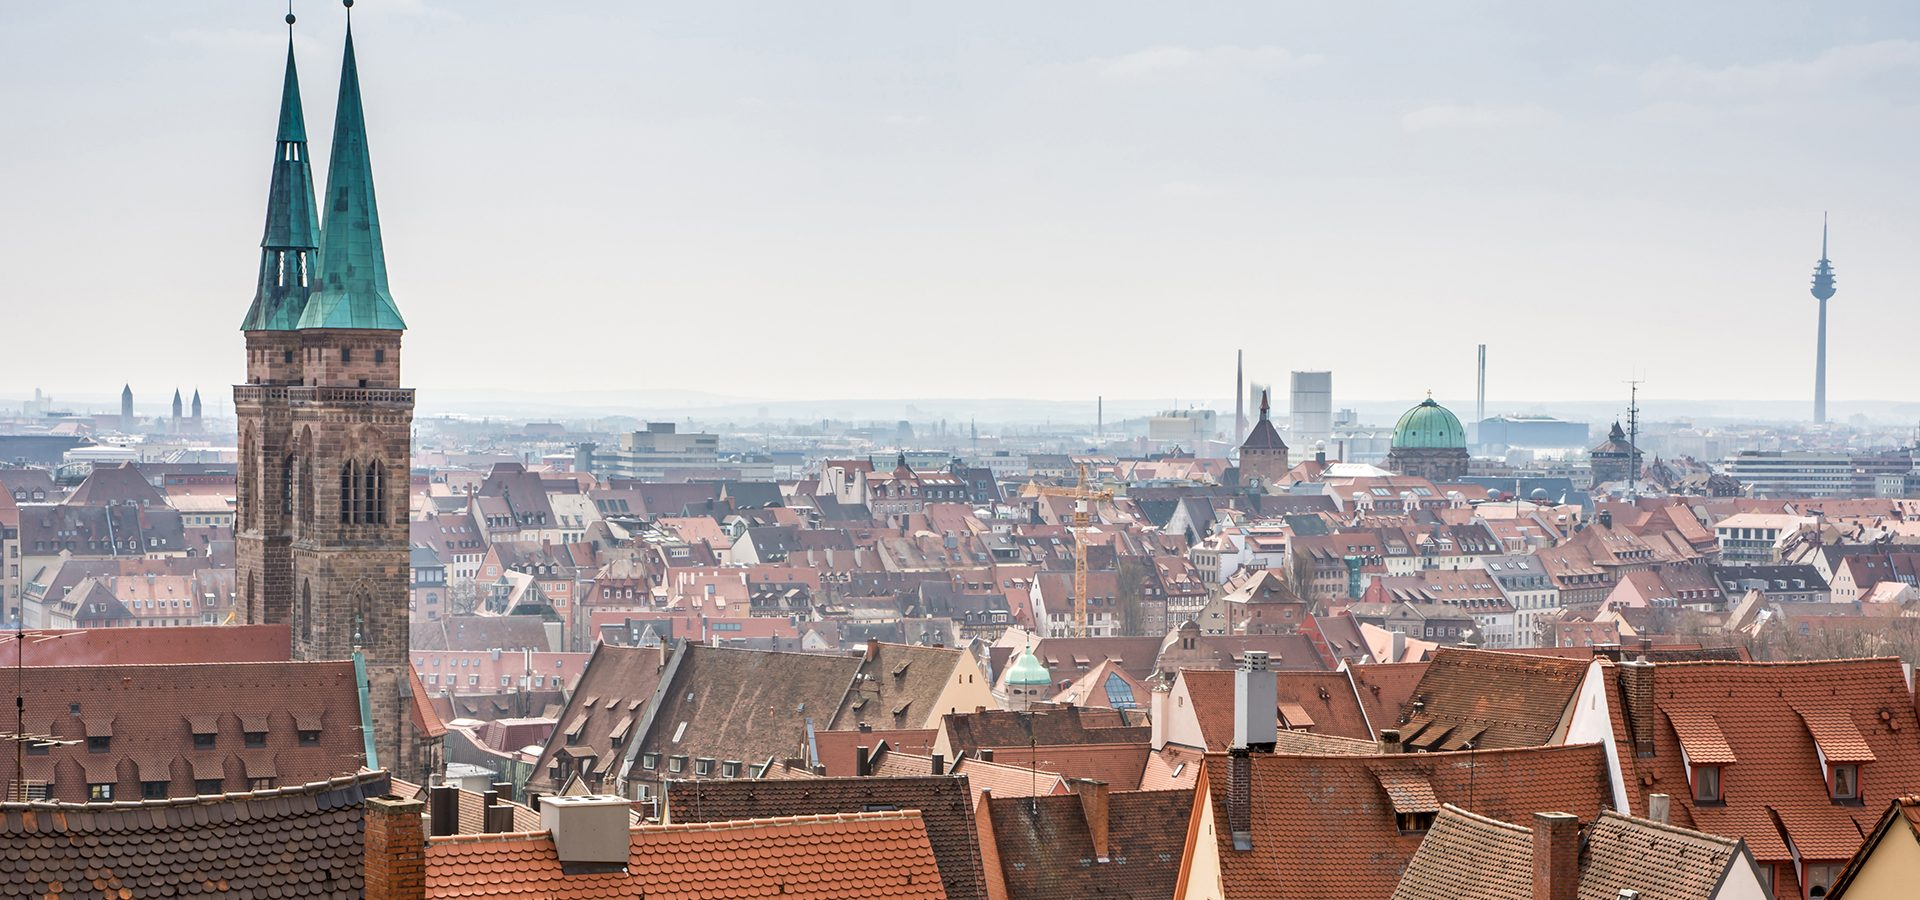 CSU Stadtratsfraktion Nürnberg - Blick über Nürnberg